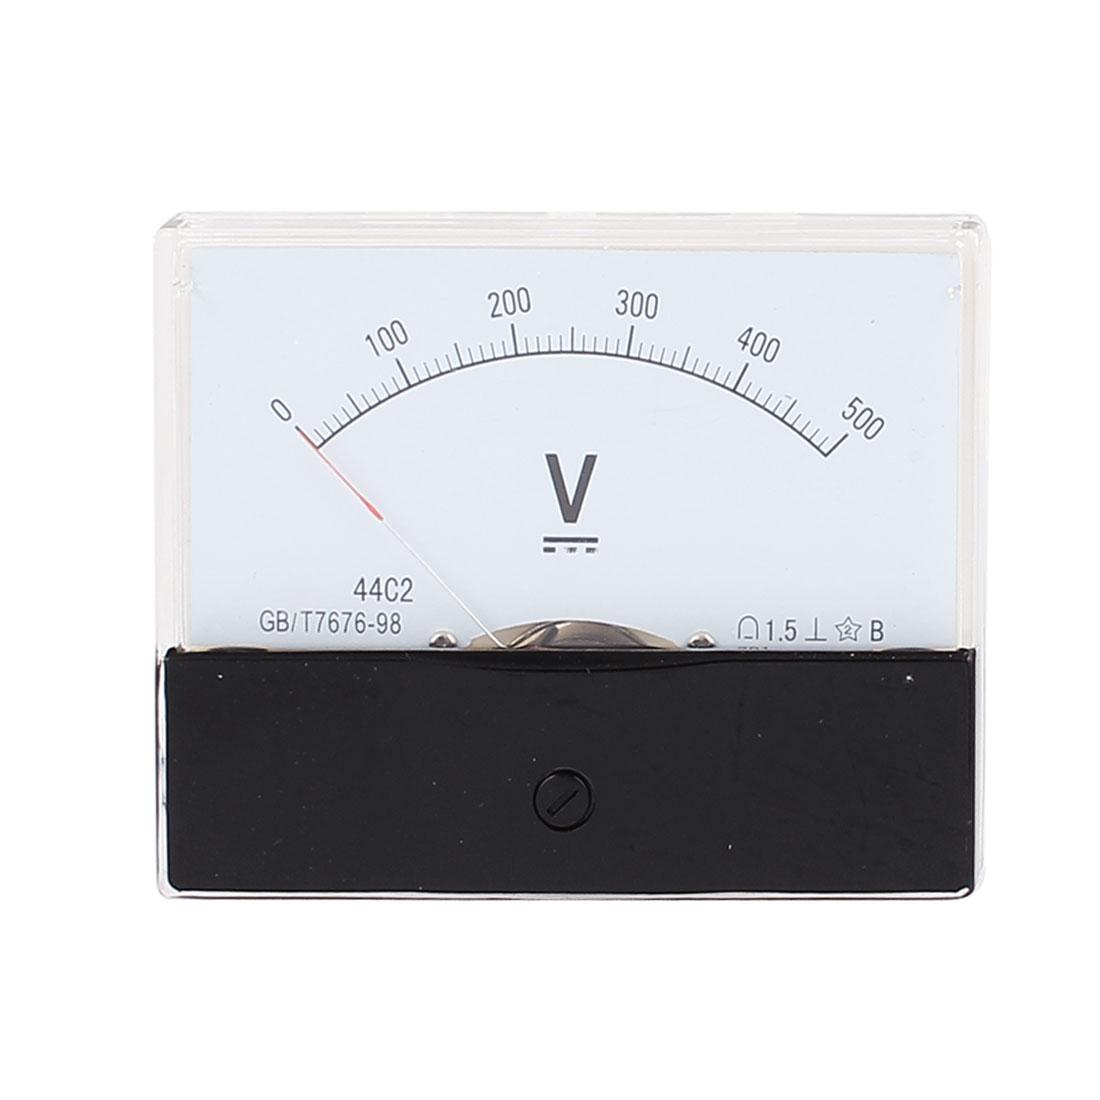 44C2 Pointer Needle DC 0-500V Volt Tester Panel Analog Voltmeter 100mm x 80mm